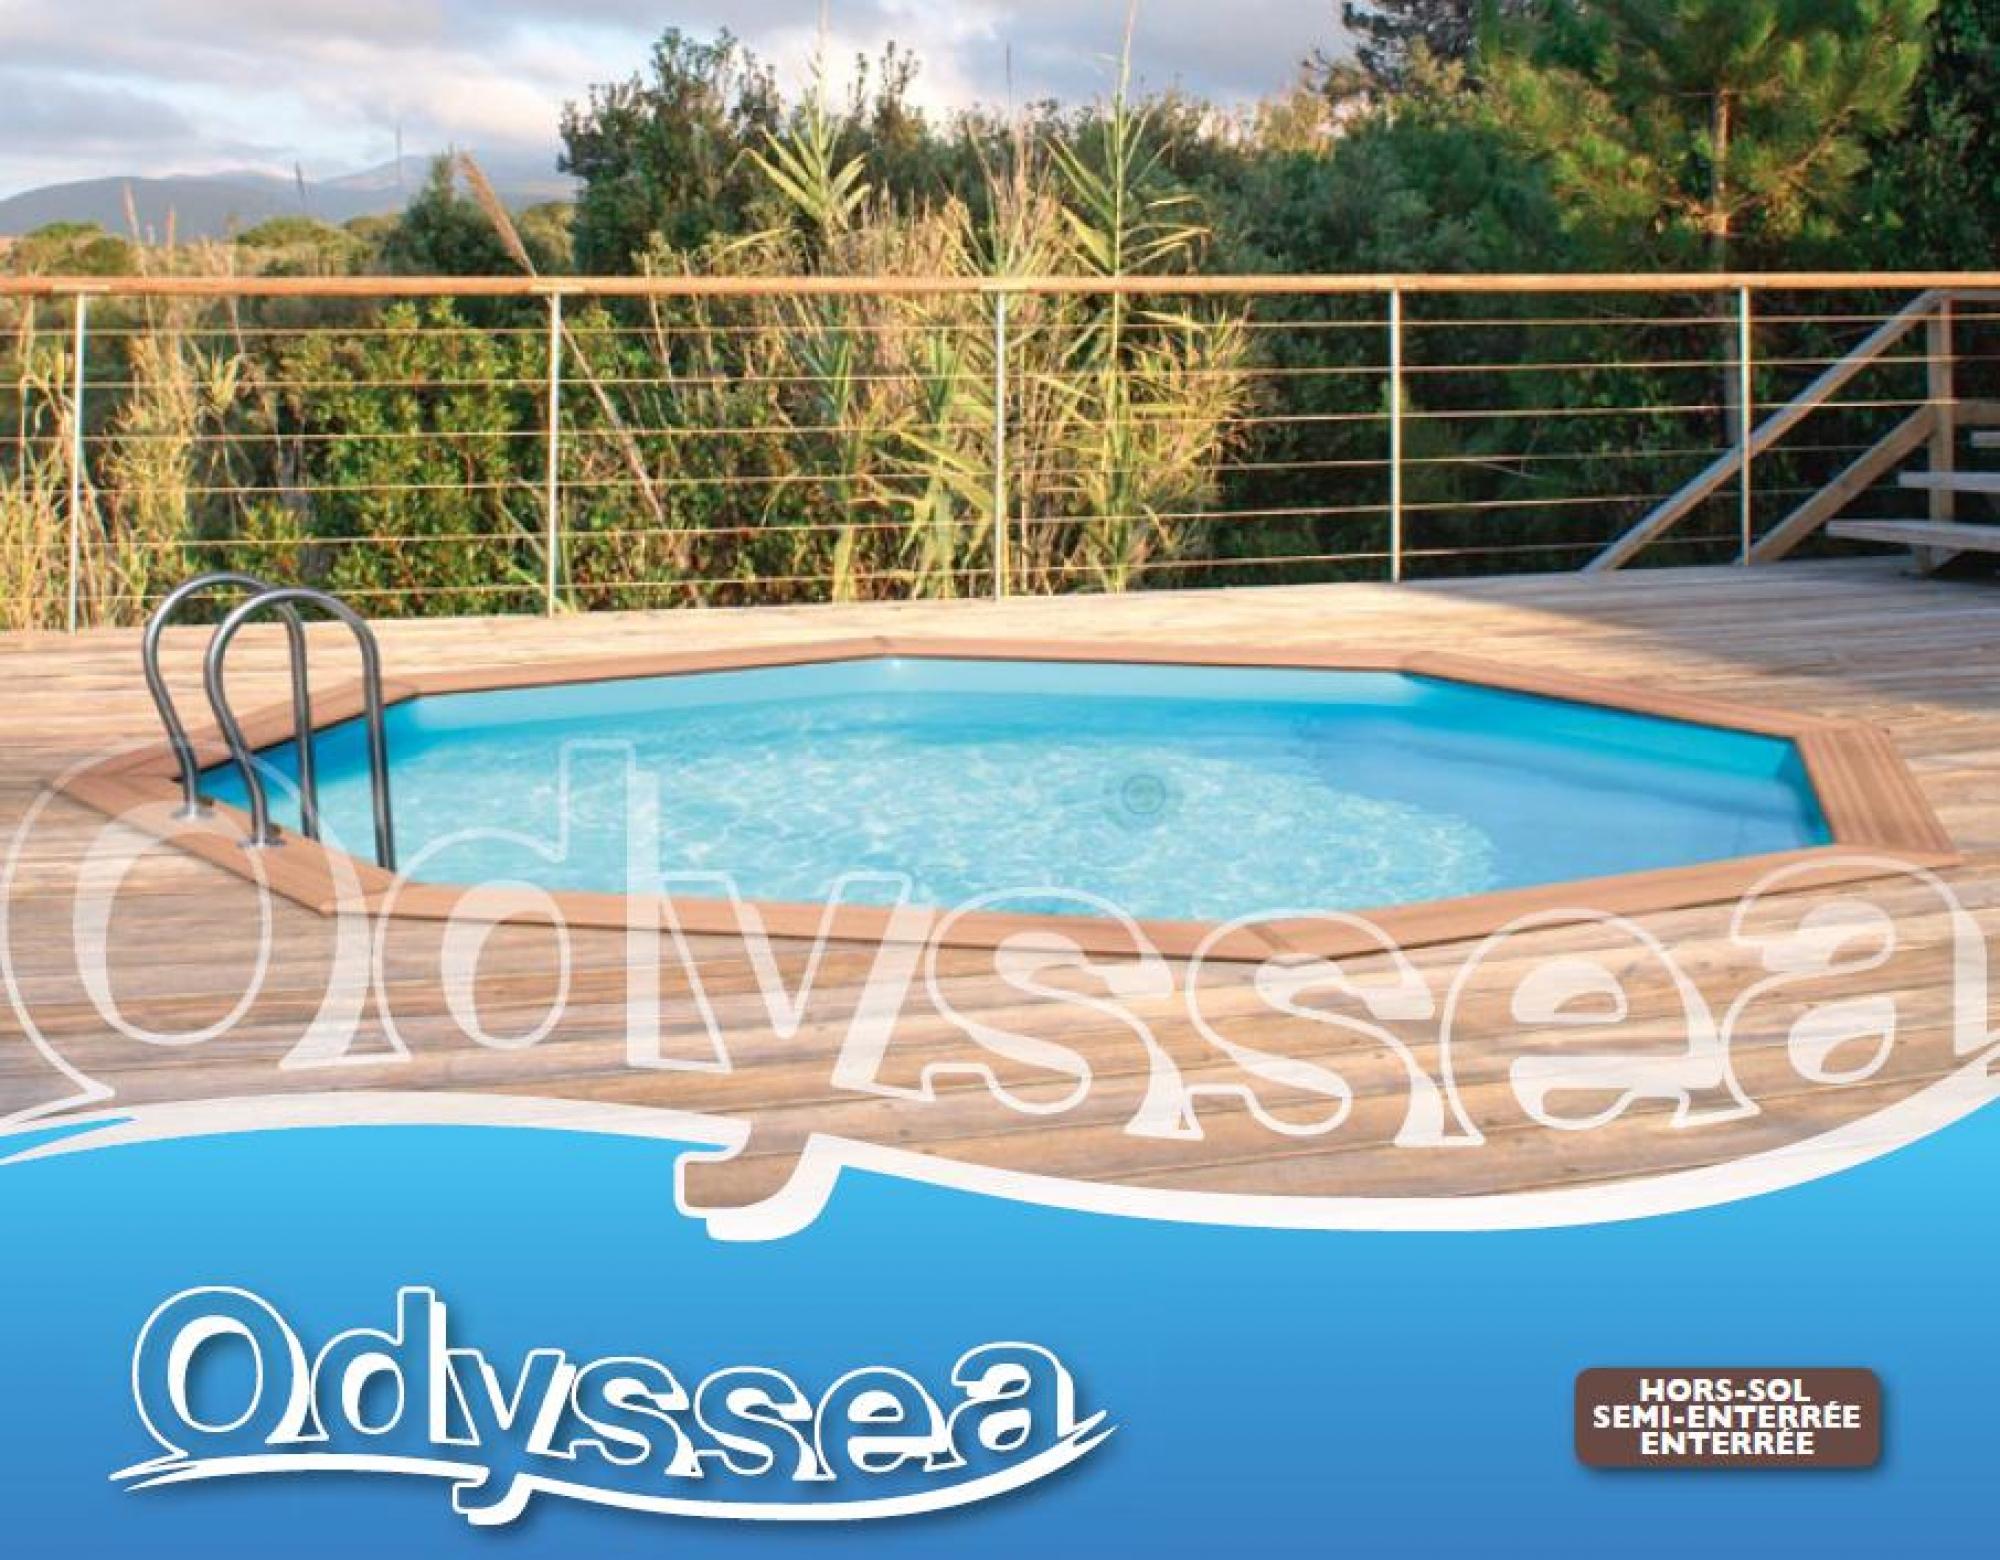 Piscine Bois Proswell By Procopi, La Gamme Odyssea ! Aquarev ... destiné Piscine Proswell